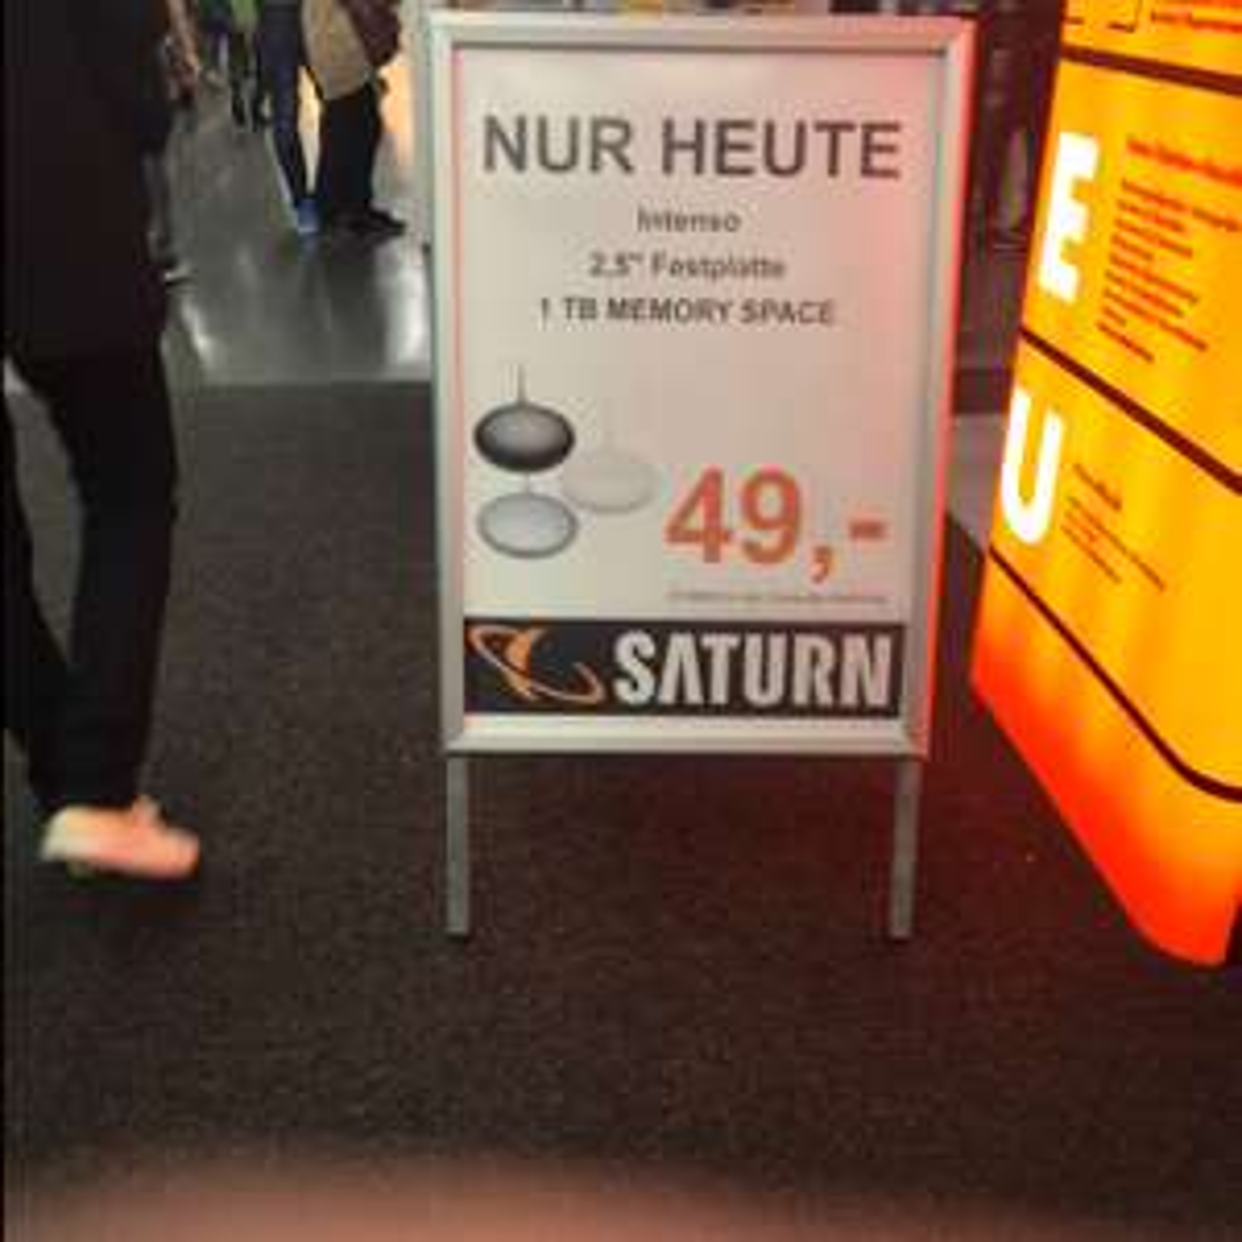 Intenso Memory Space 1TB (lokal) Saturn Neuhauser Straße München NUR HEUTE